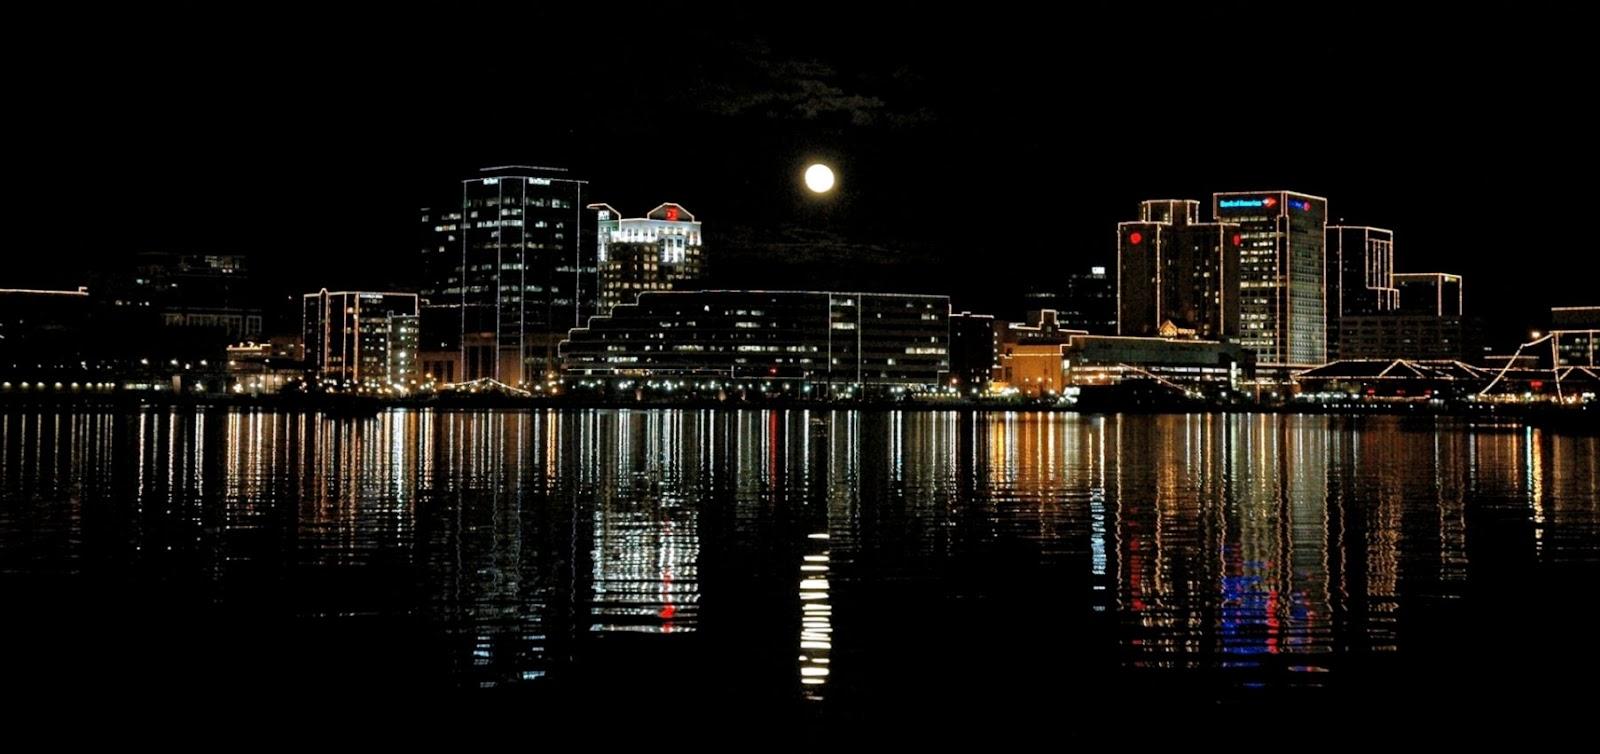 city during nighttime free image Peakpx